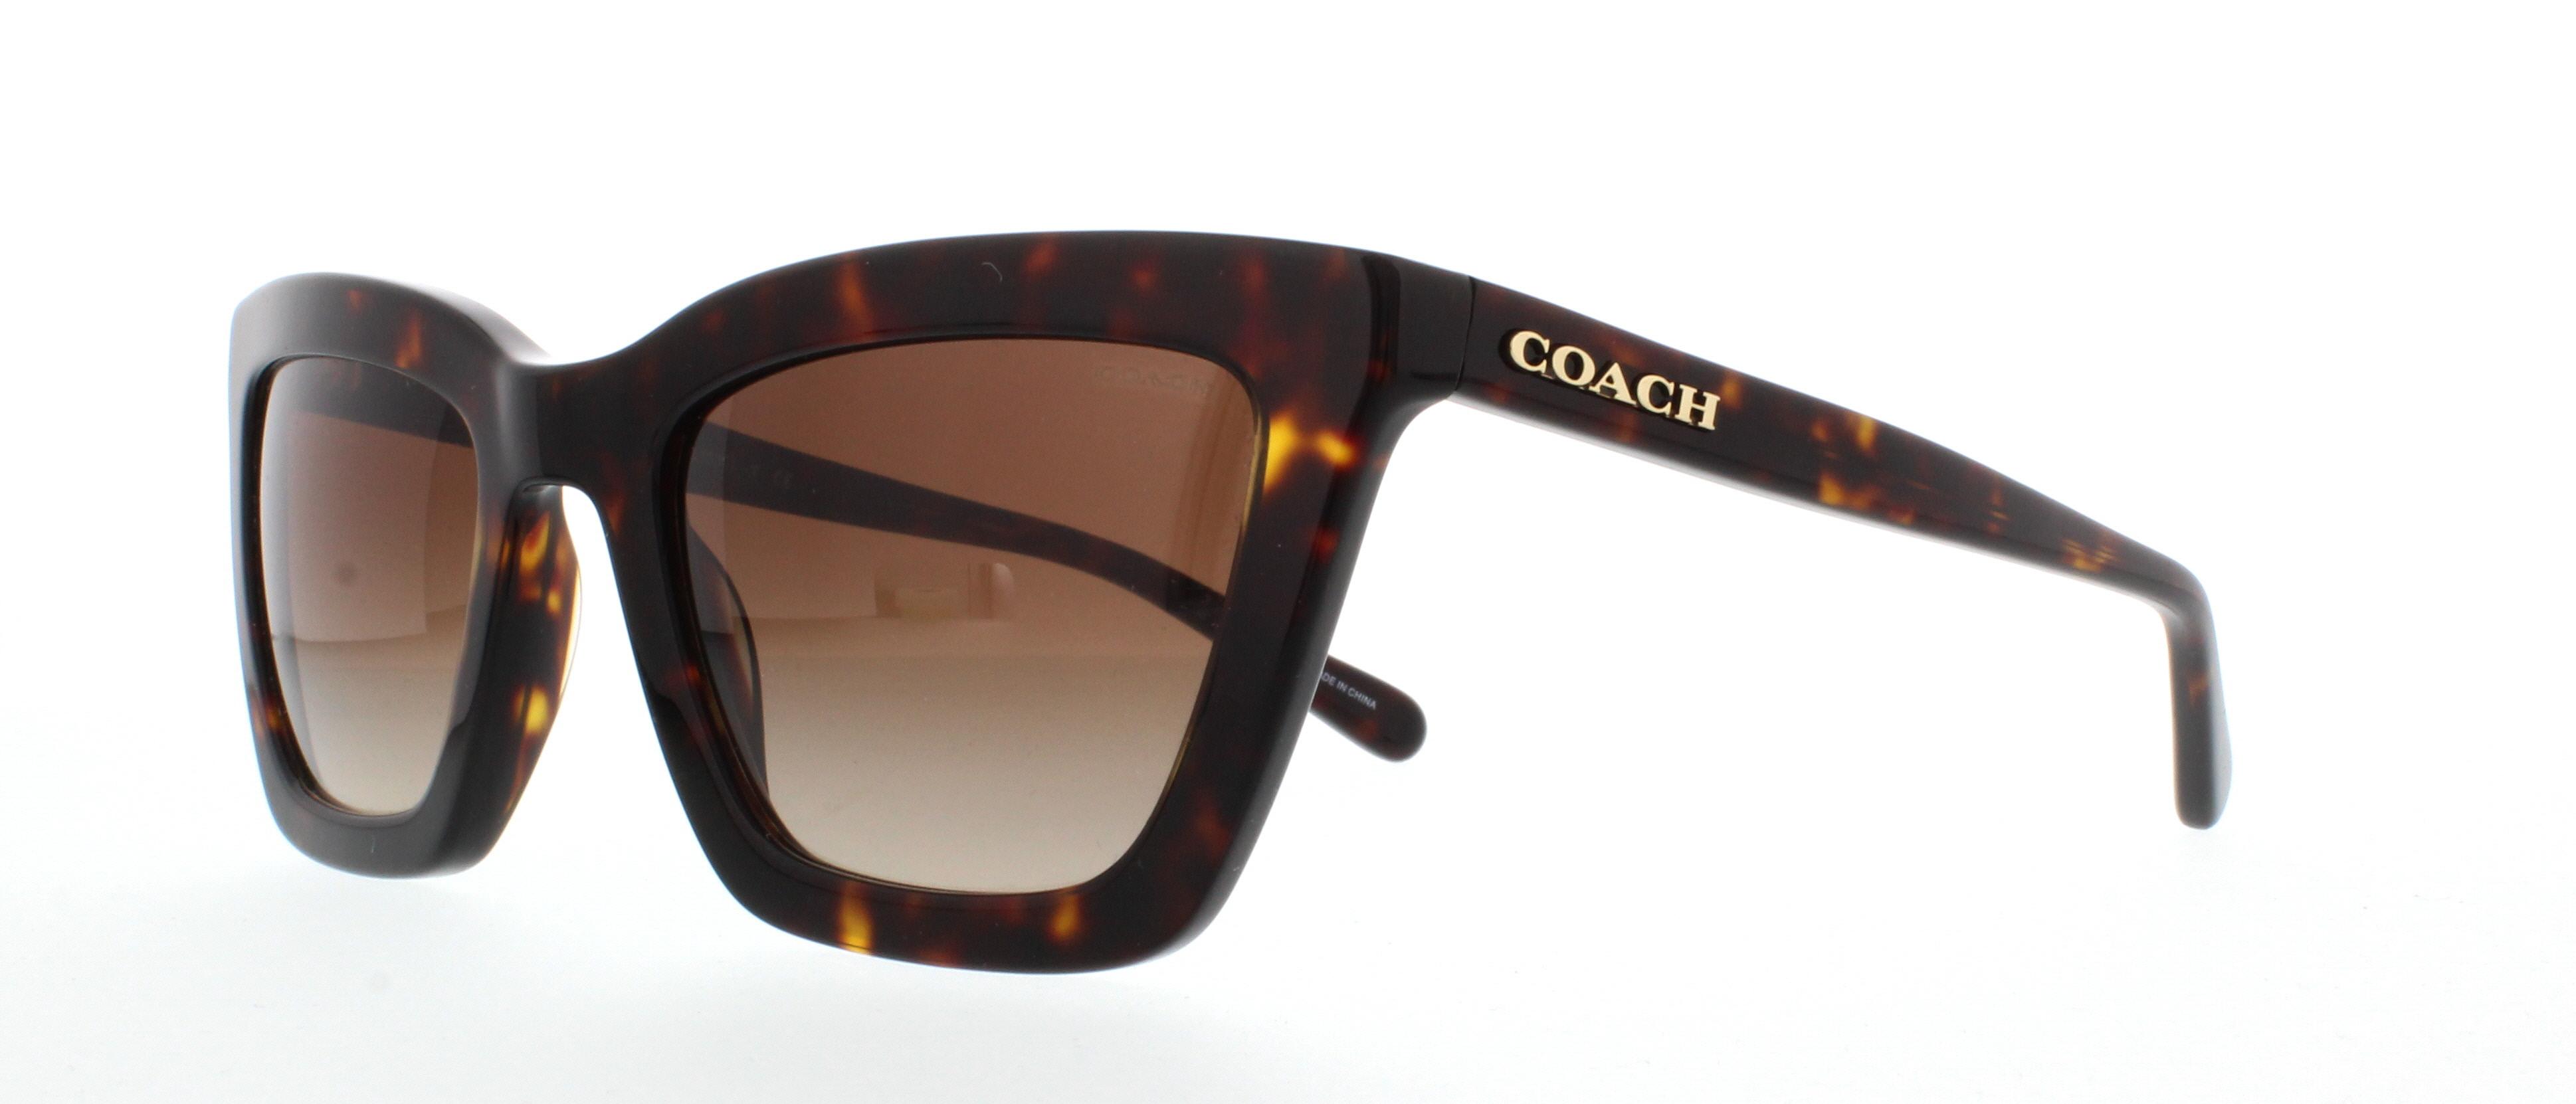 c3387ff7e210f ... promo code for coach sunglasses hc8203 l1630 512013 dark tortoise 54mm  e40b0 04492